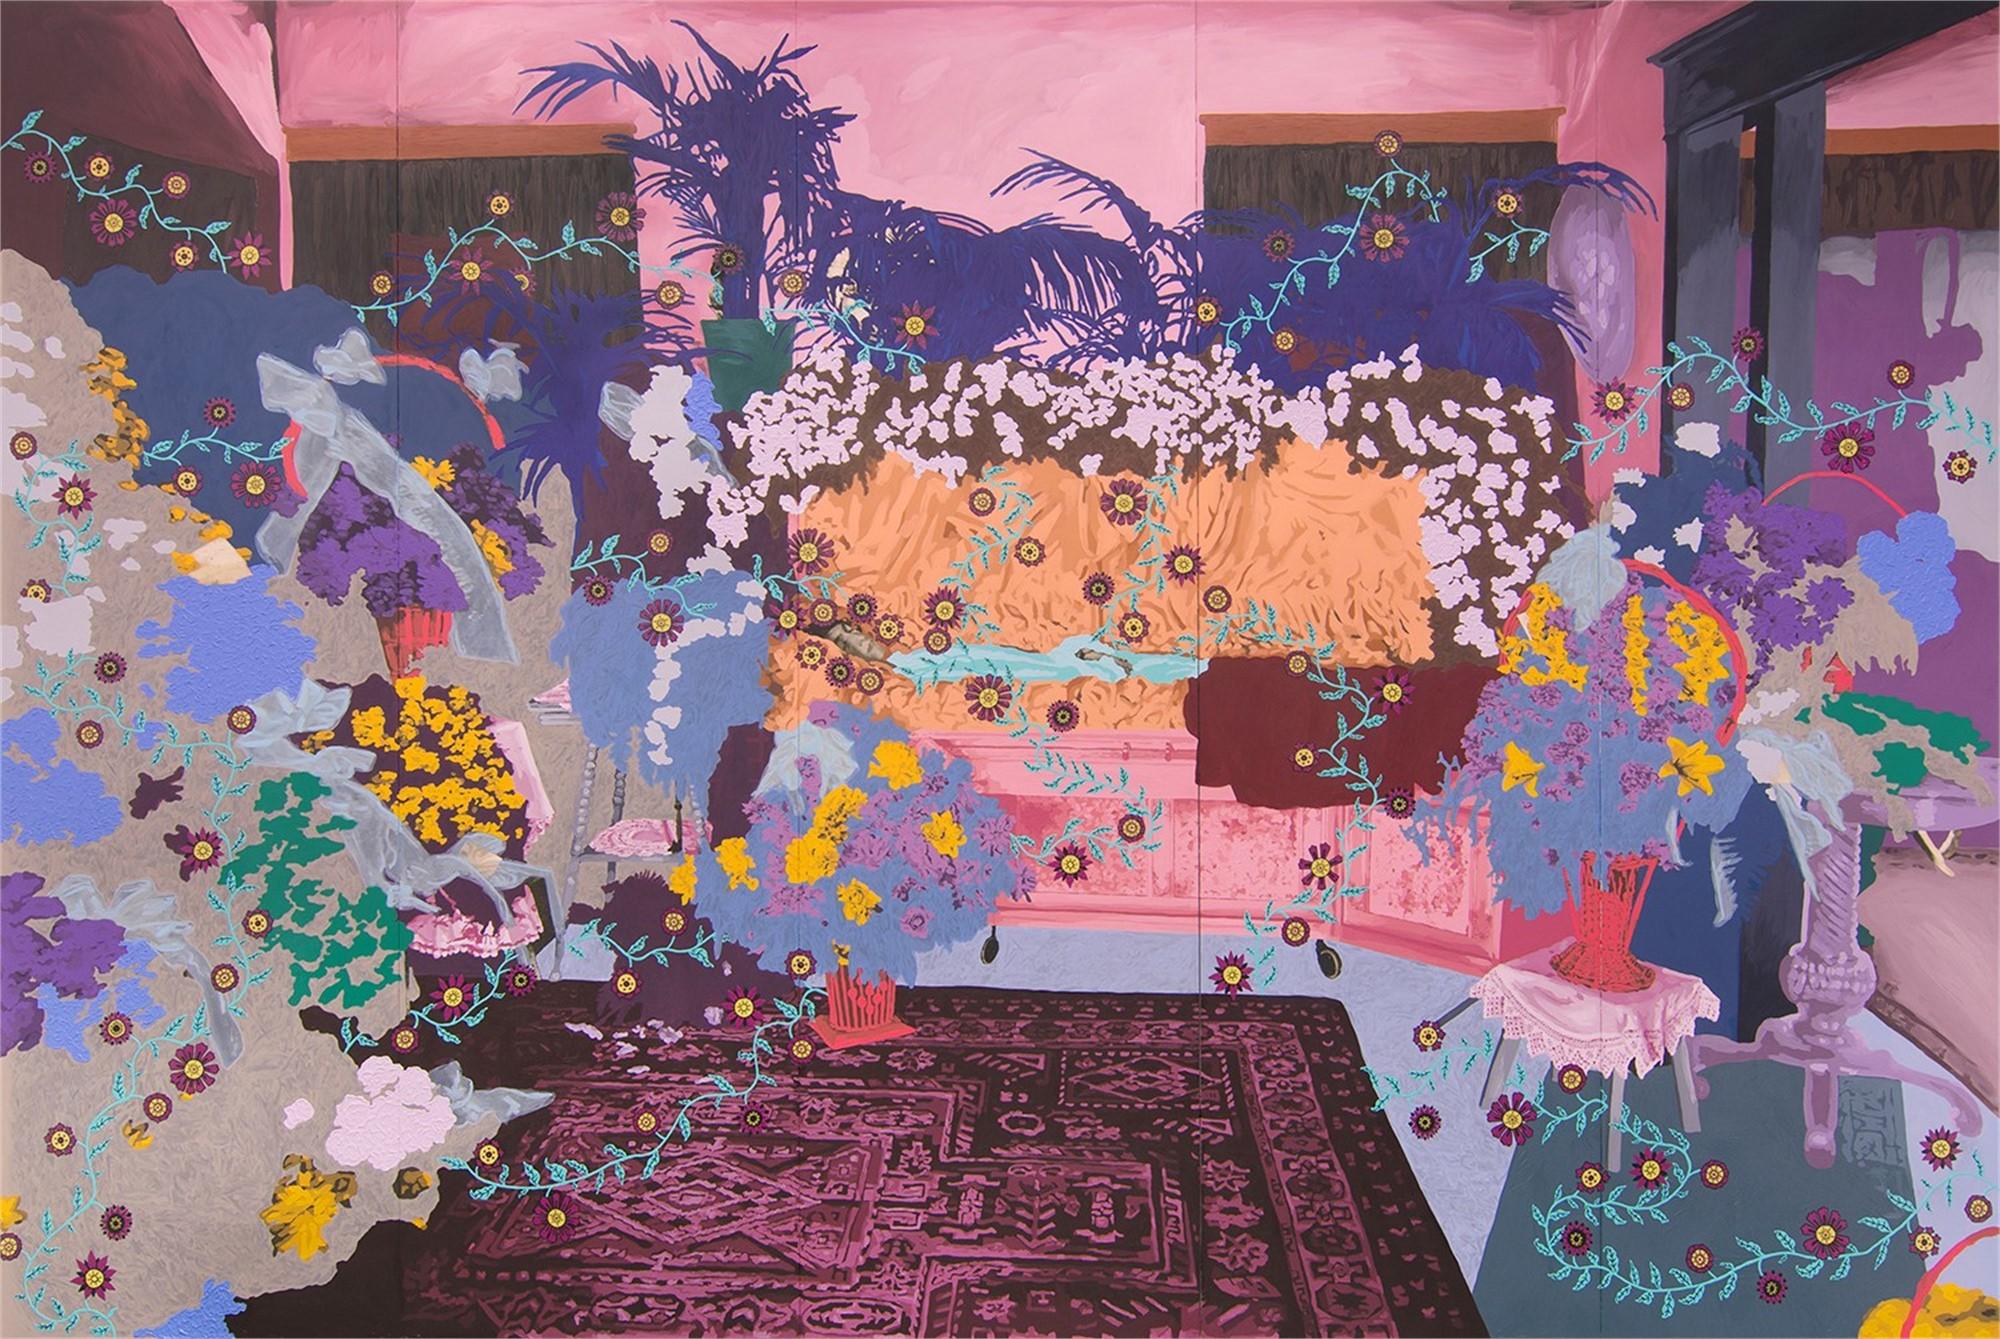 Untitled (Of Hoston) by Daisy Patton